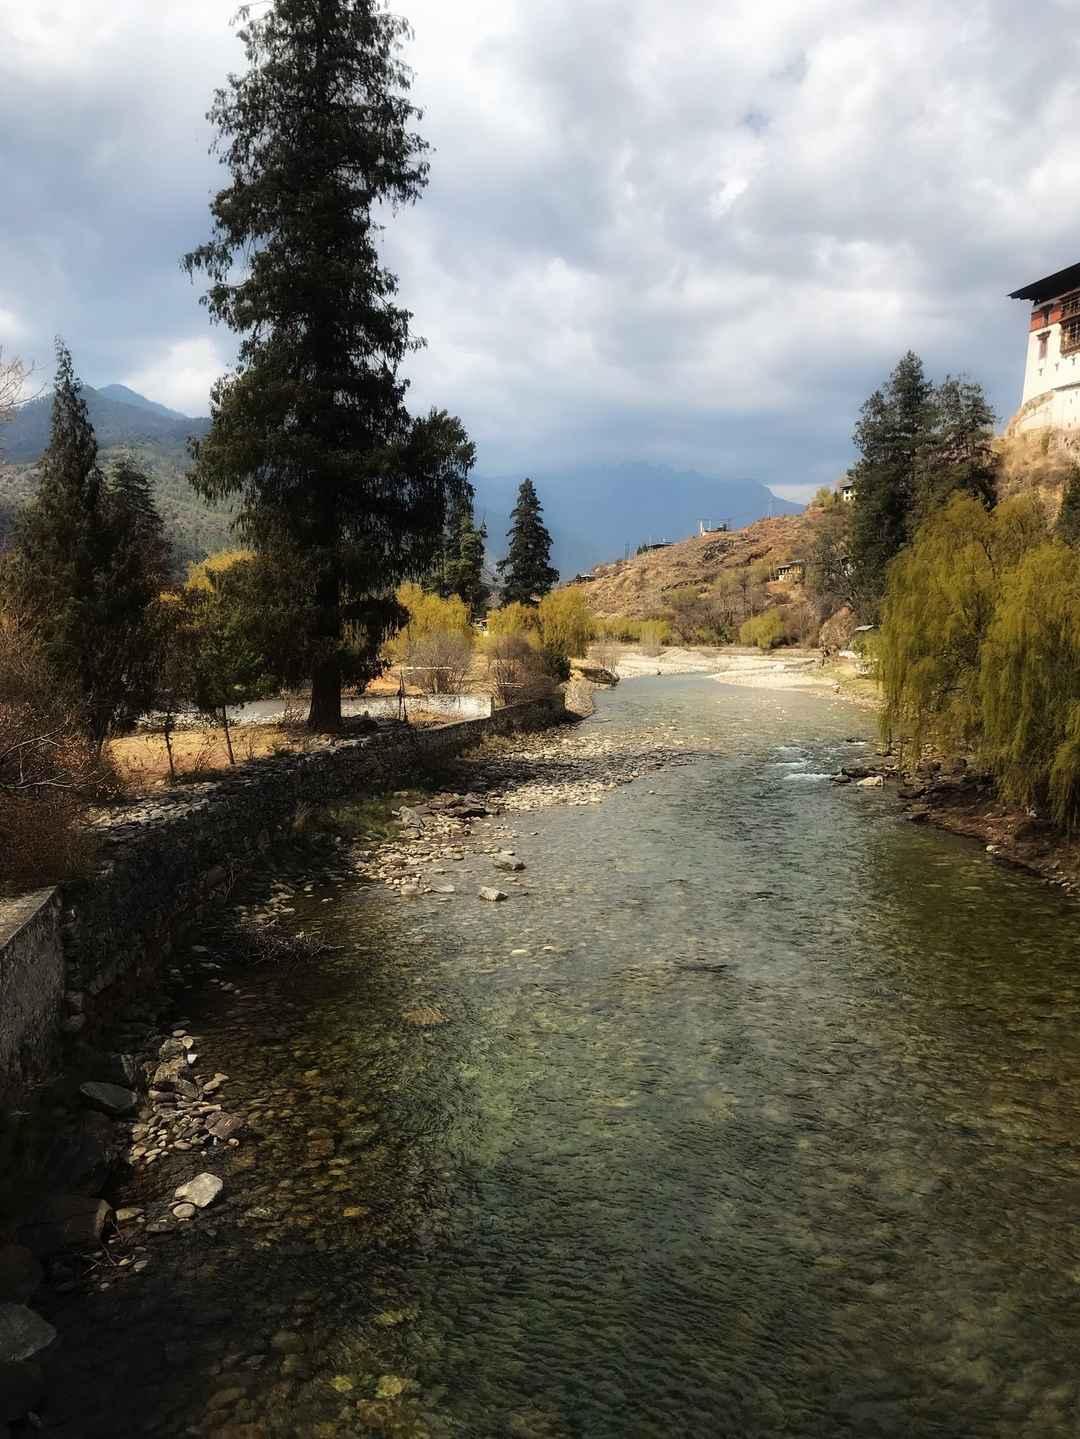 Bhutan Visa: All The Details